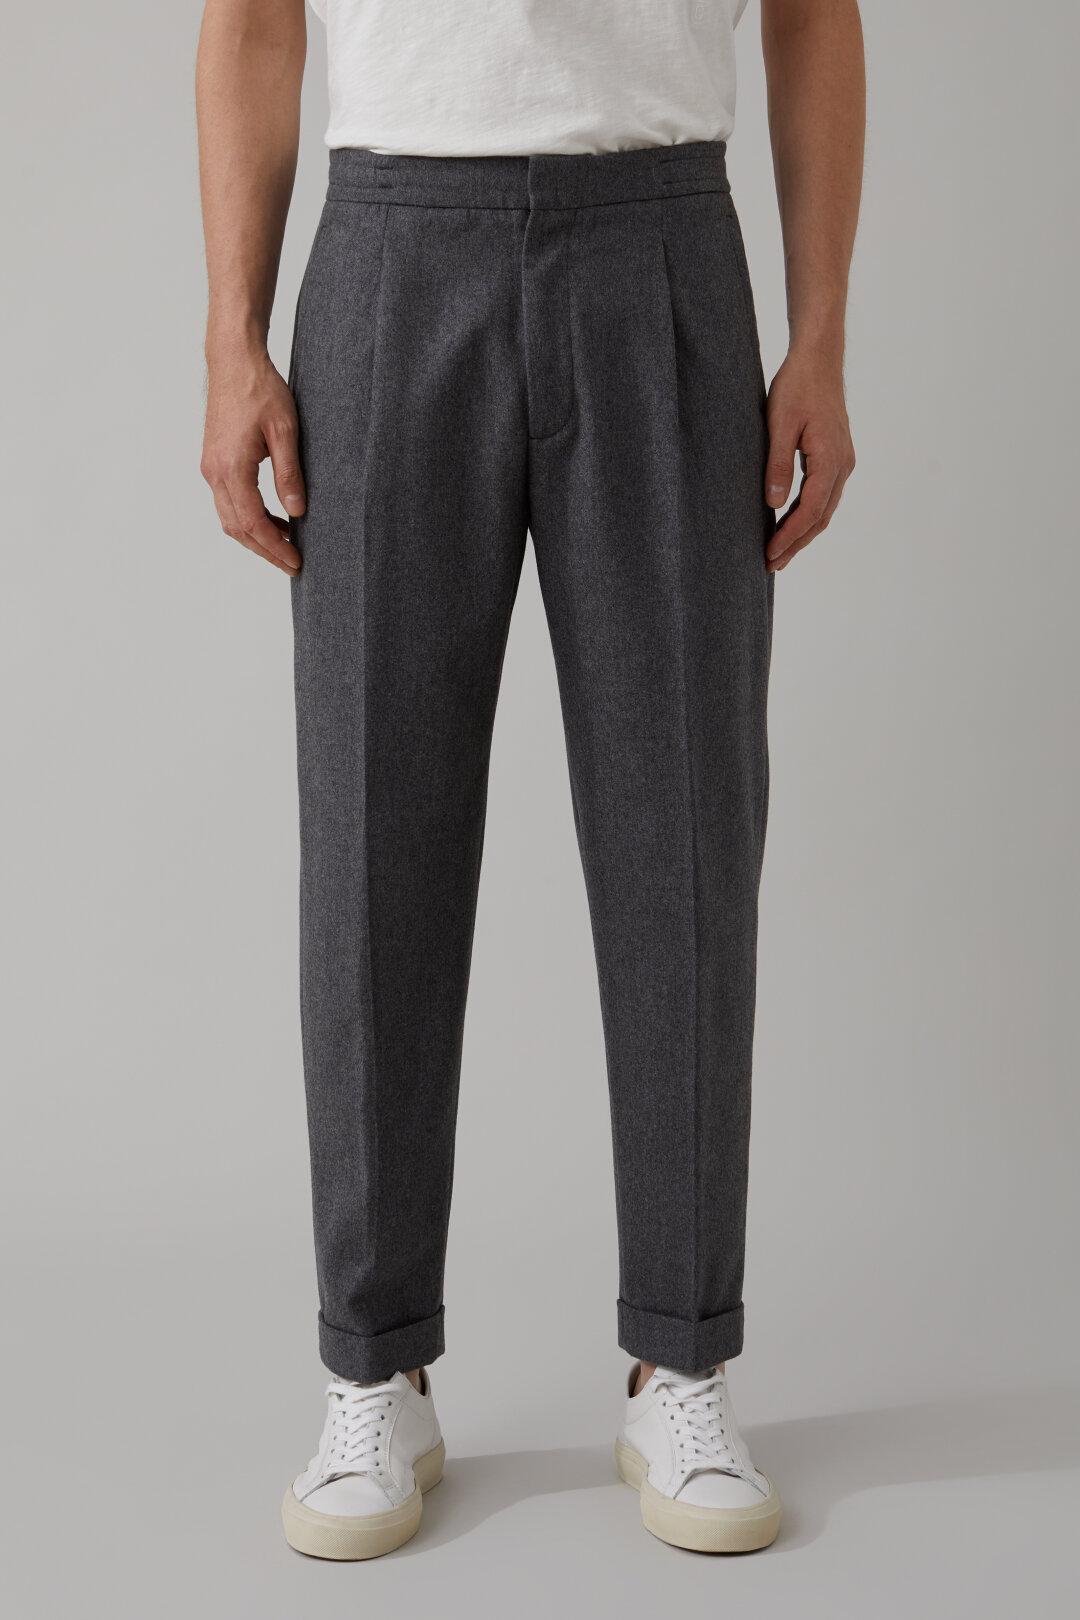 Lexington Relaxed Wool Pants